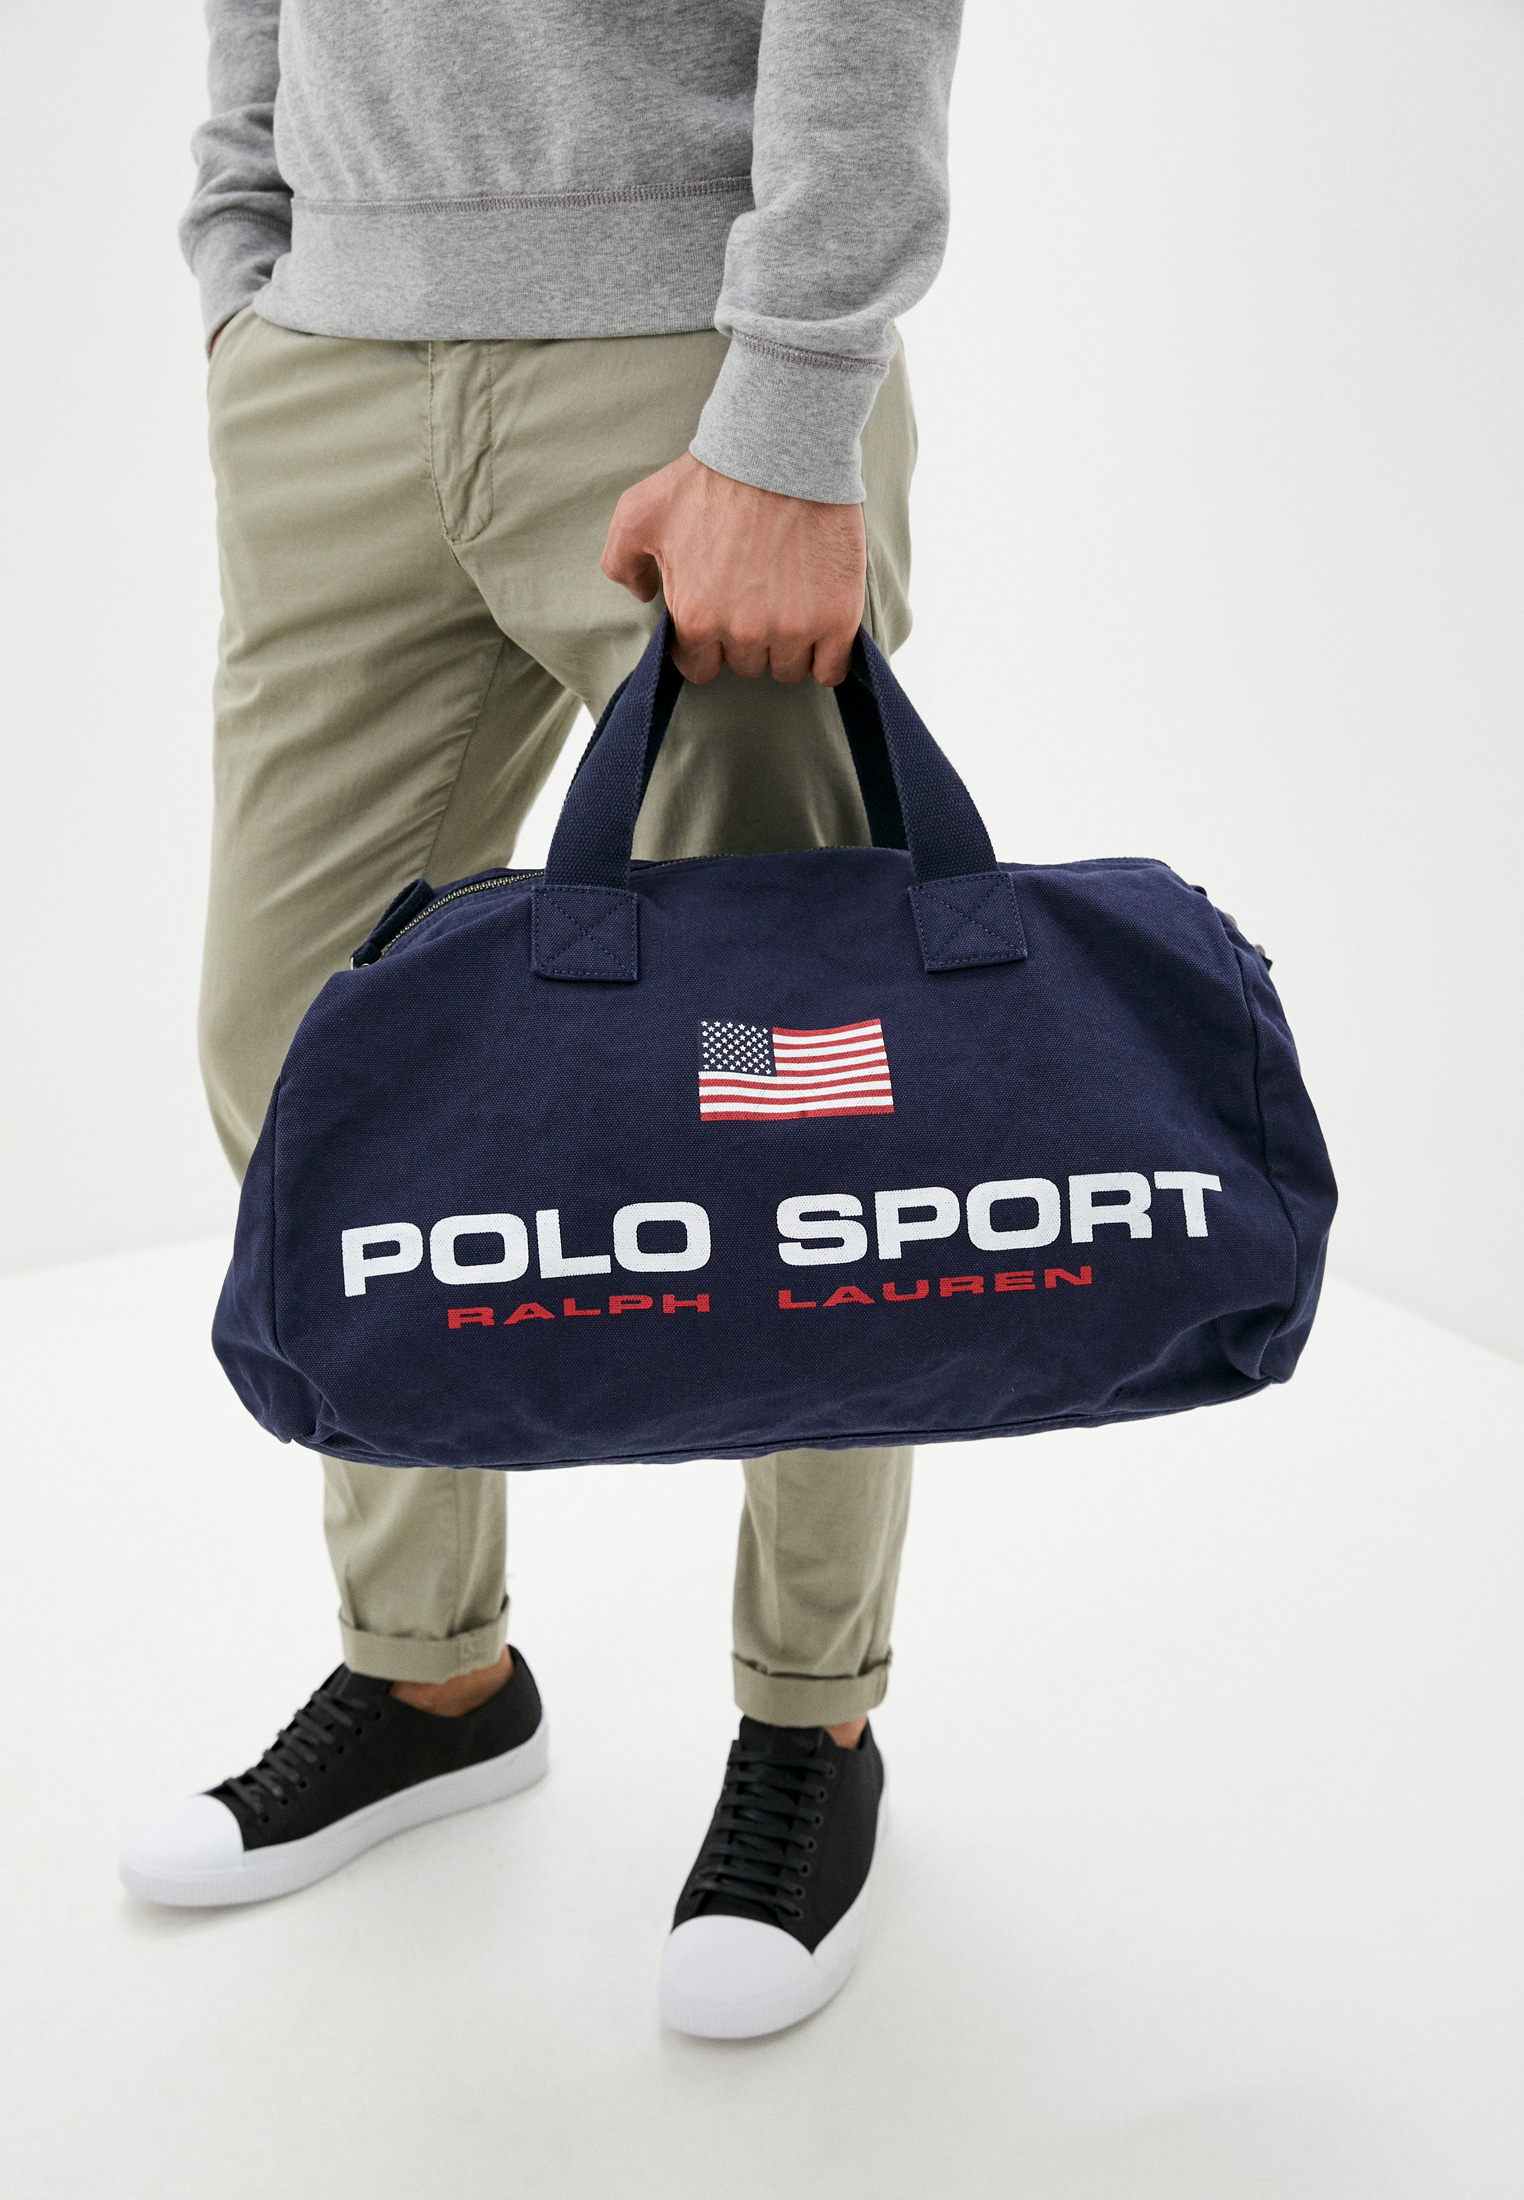 Дорожная сумка Polo Ralph Lauren Сумка дорожная Polo Ralph Lauren